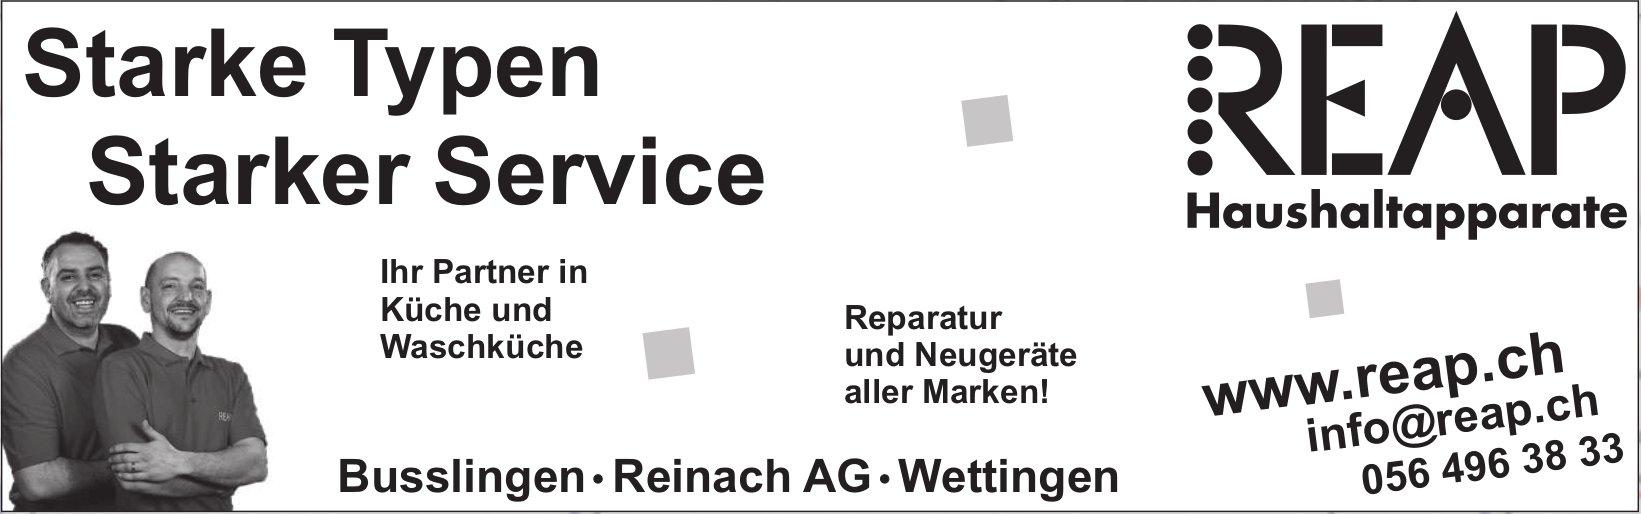 REAP Haushaltapparate, Busslingen - Starke Typen. Starker Service